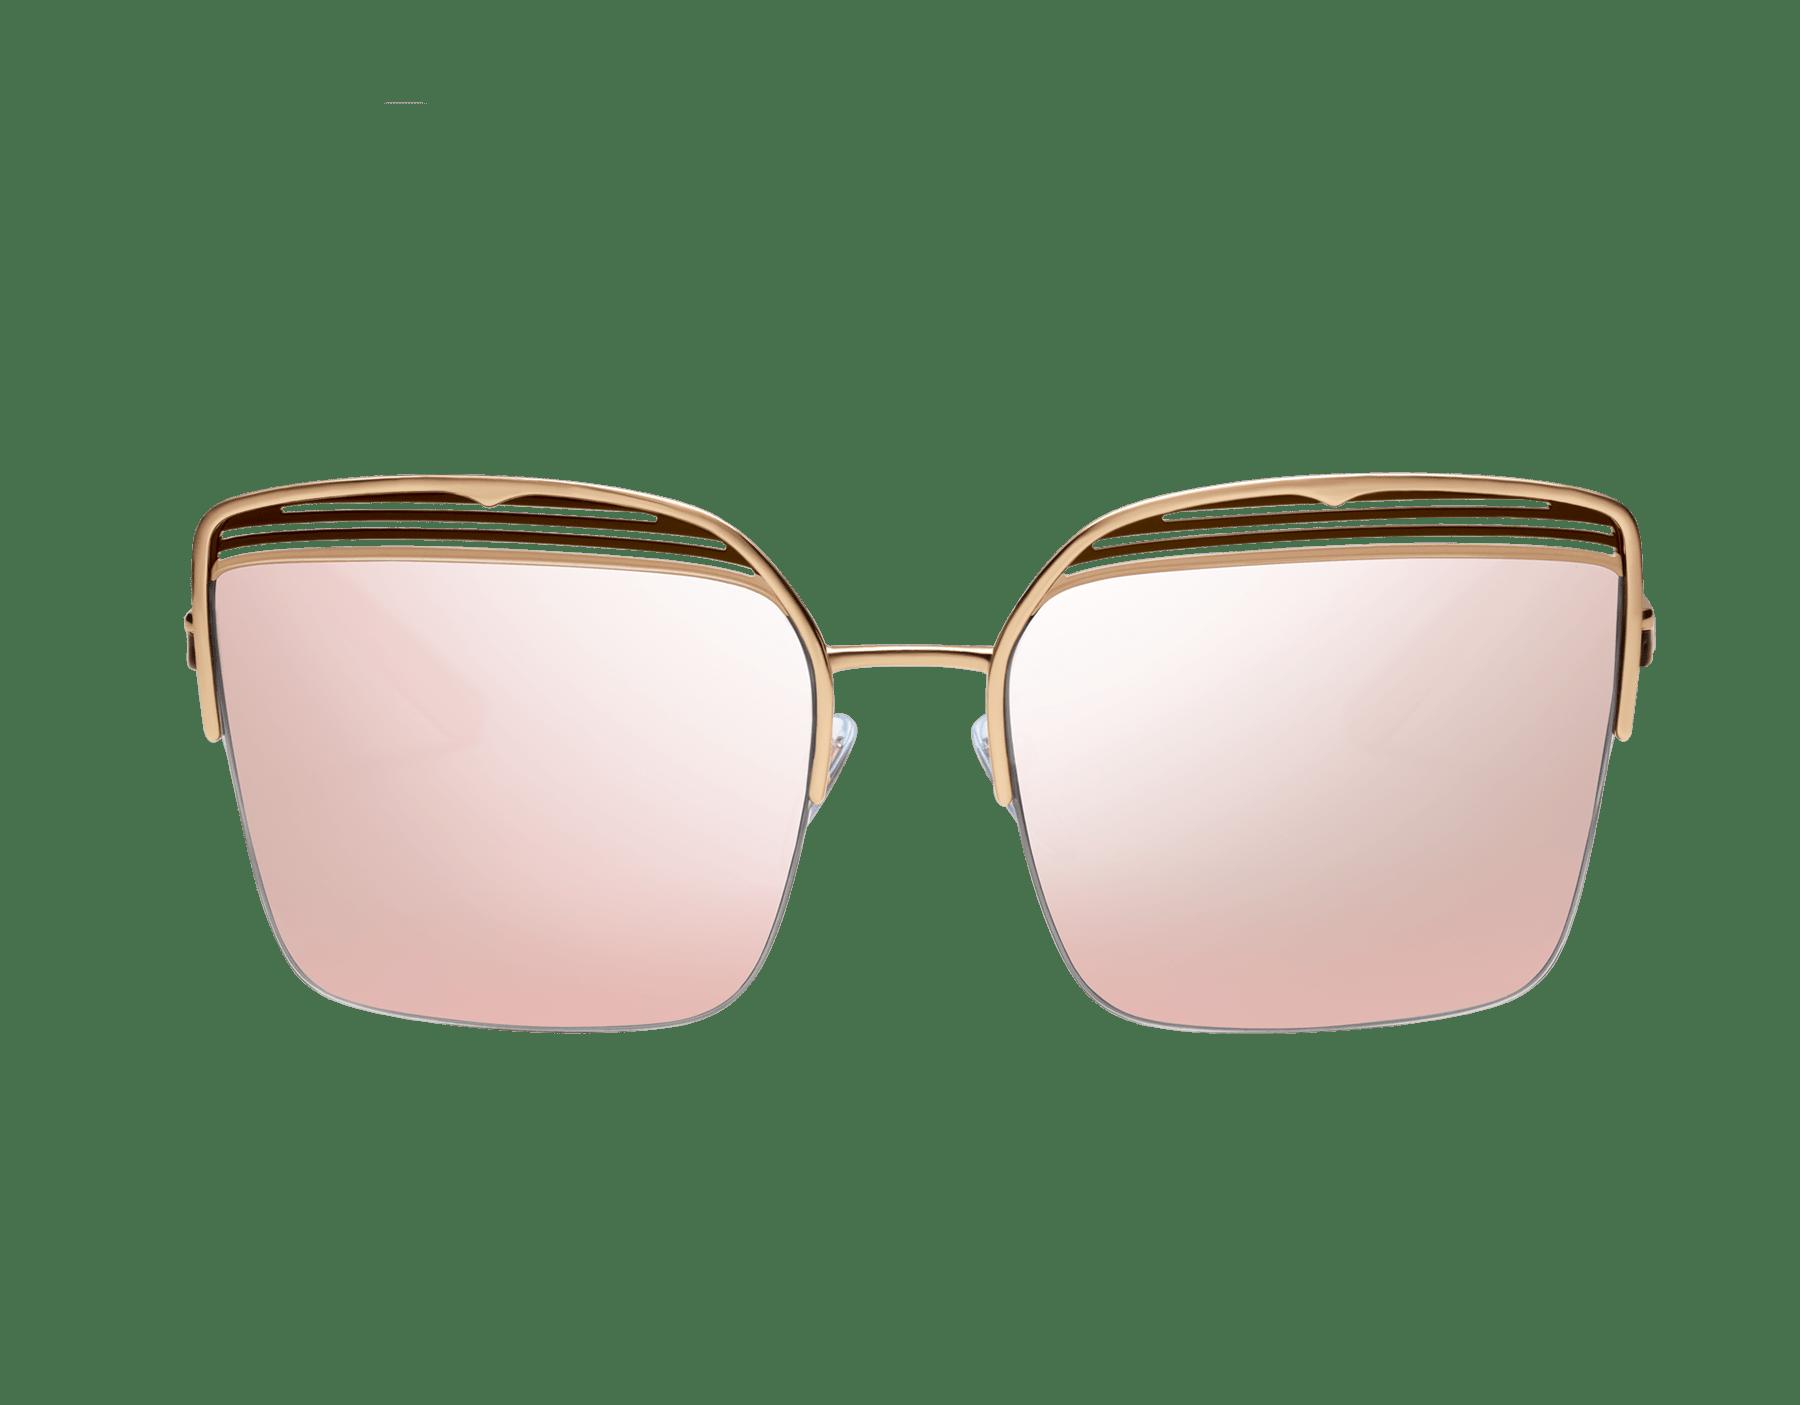 Bvlgari B.zero1 B.overvibe half-rim square metal sunglasses. 903812 image 2